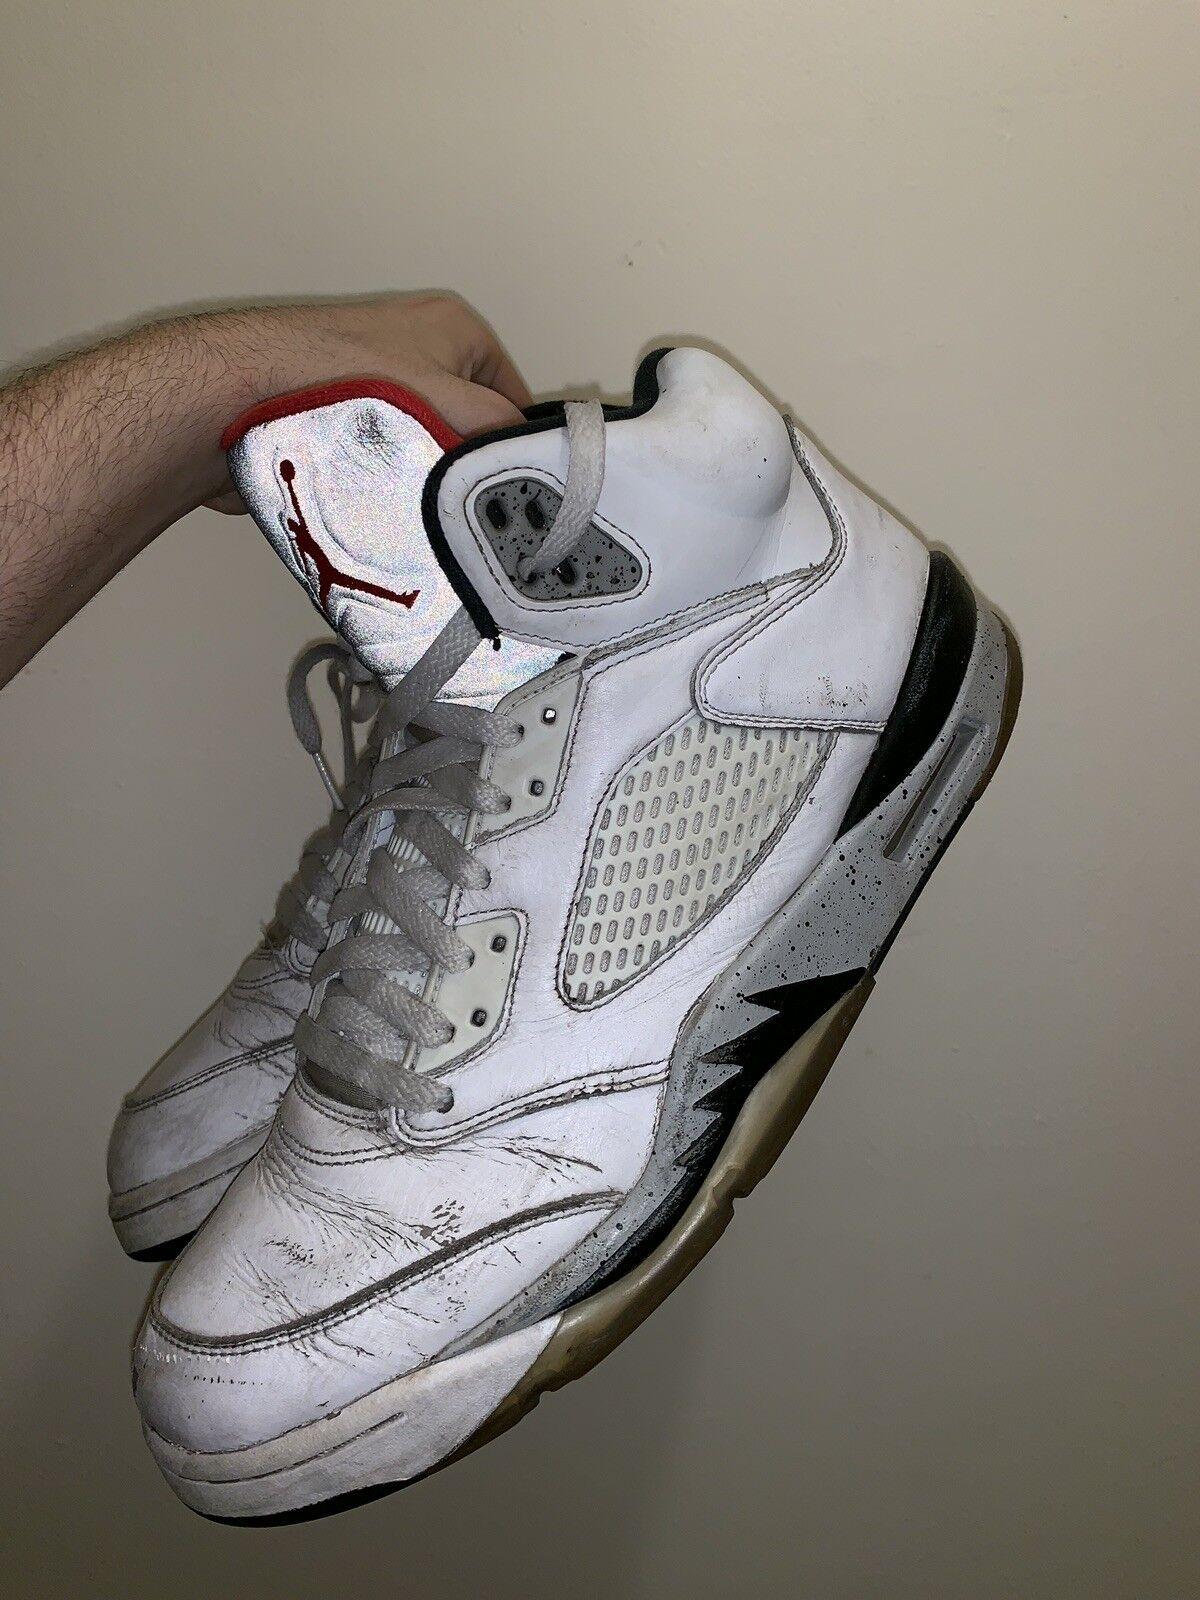 Nike Nike Nike air jordan 5 retrò di cemento bianco - bianco - rosso 136027-104 noi taglia 11 università | Negozio  83d876